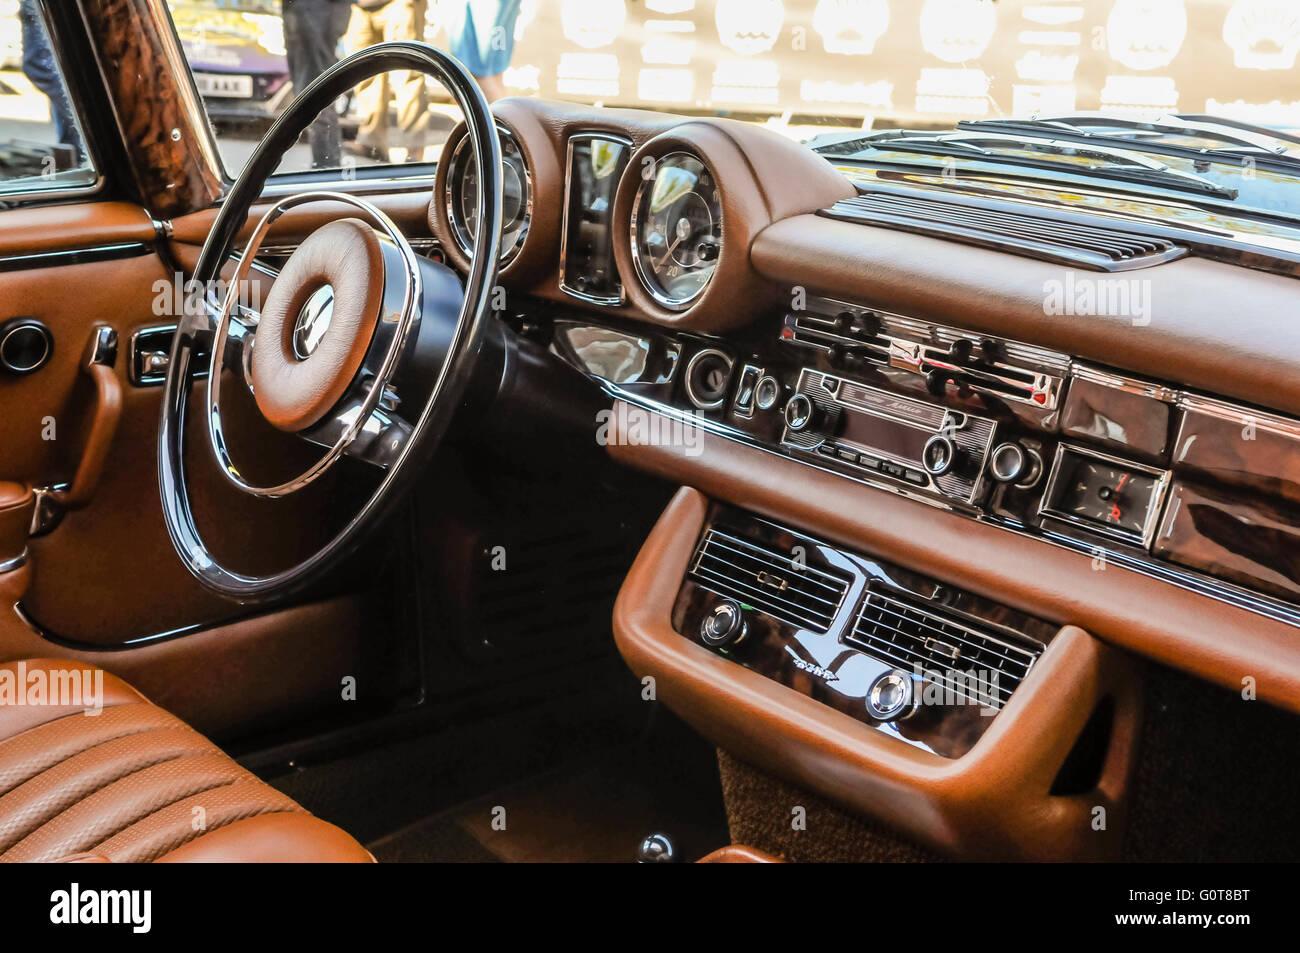 Interior Of A Restored 1970 Mercedes Benz 280 SL Coupe